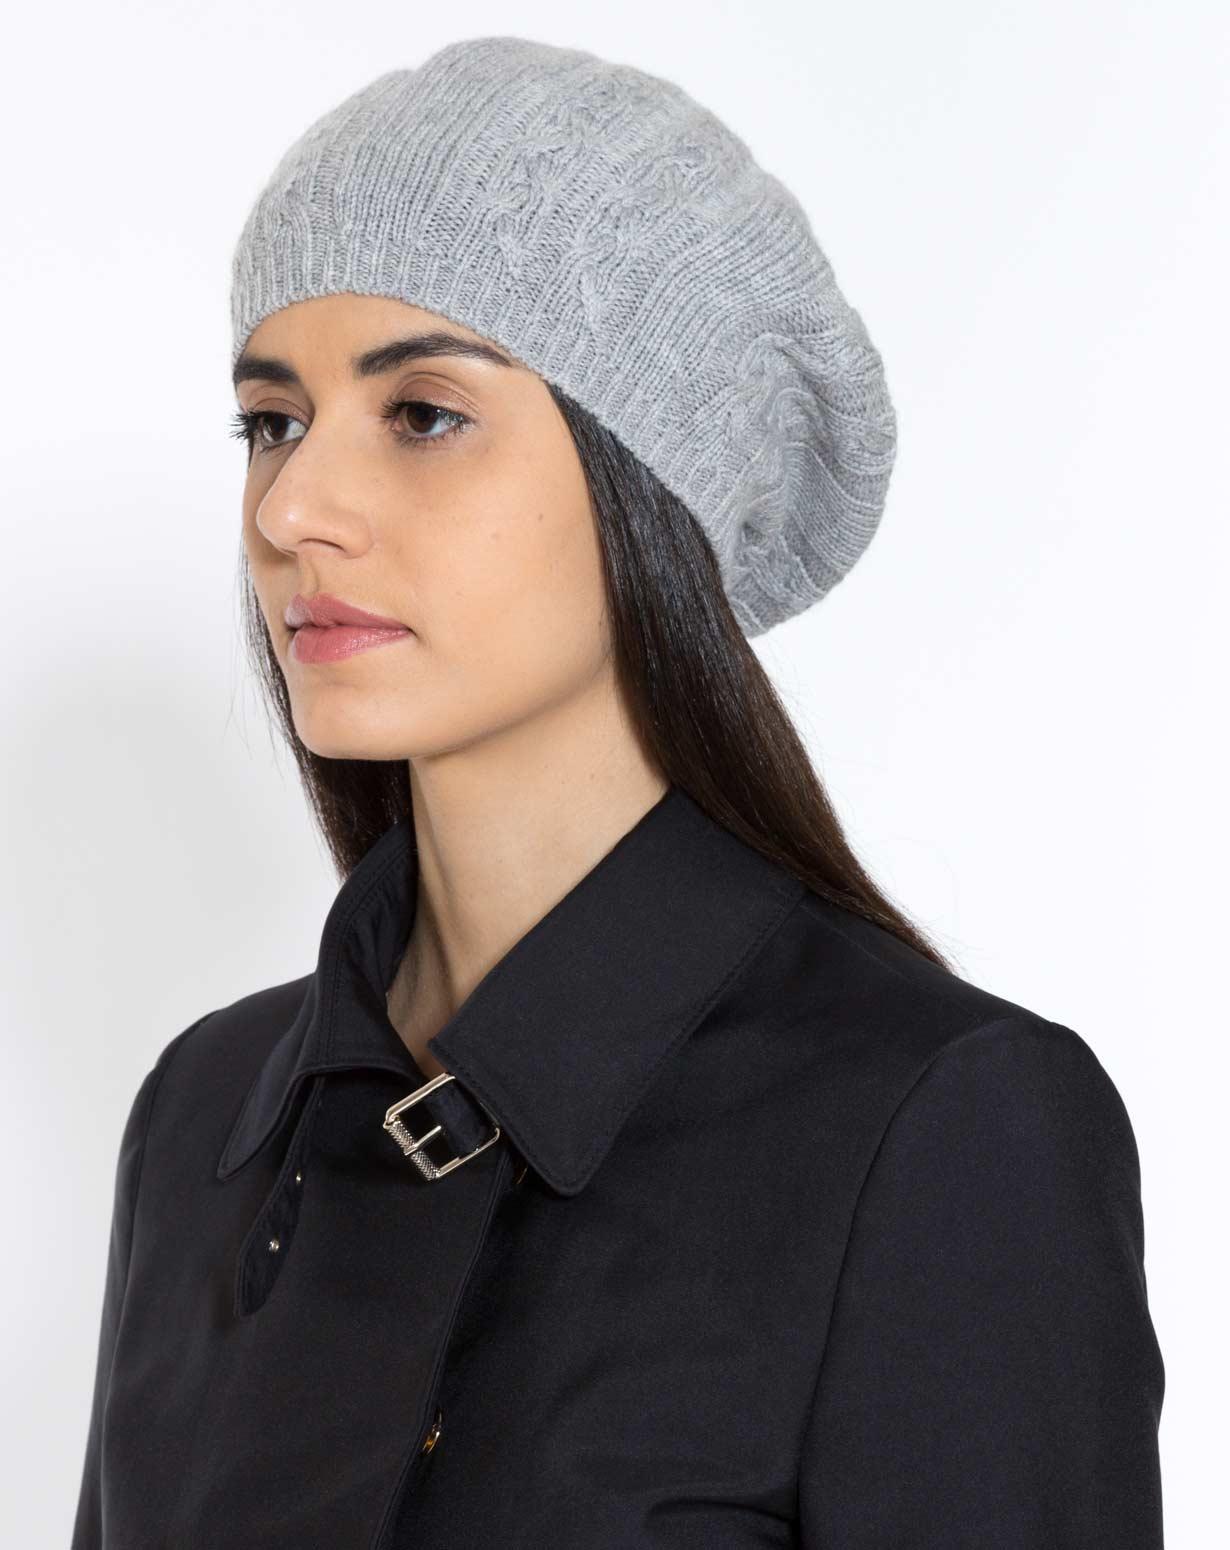 Cashmere Beret Knitting Pattern : Womens Pure Cashmere Cable Knit Beret MaisonCashmere